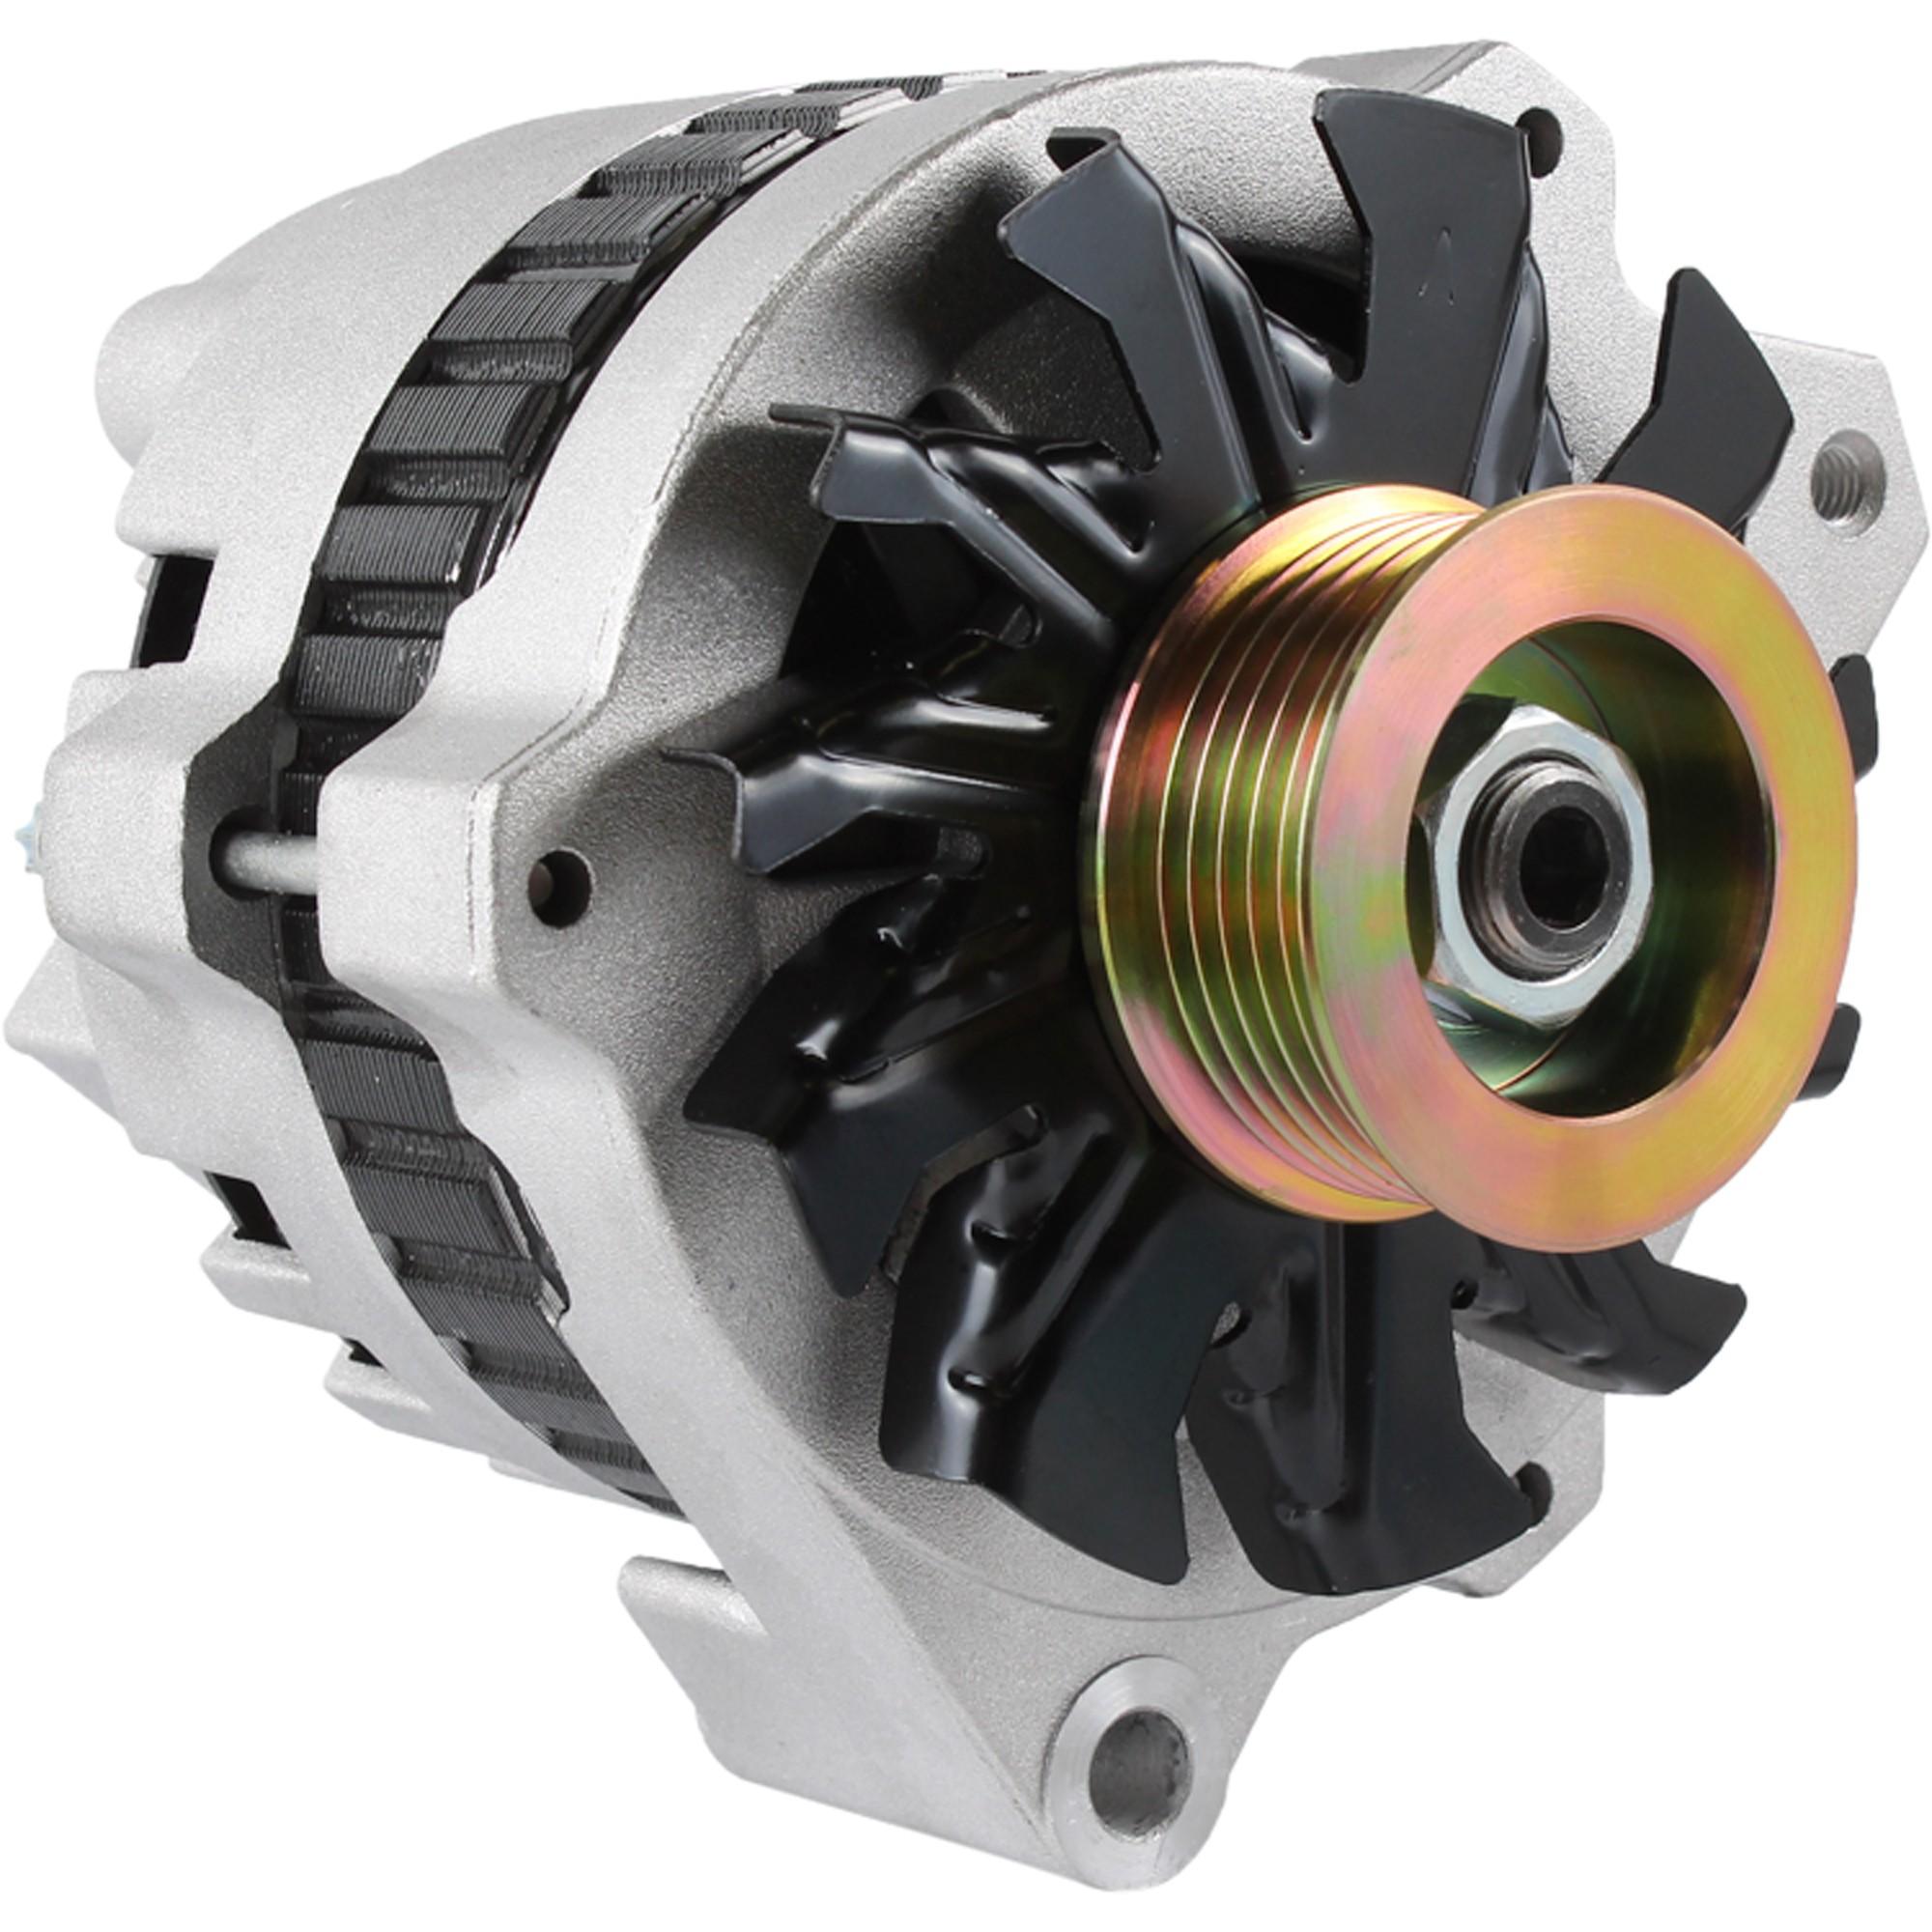 NEW OEM Replacement Alternator for Chevy Blazer S10 GMC Jimmy Sonoma V6 4.3L